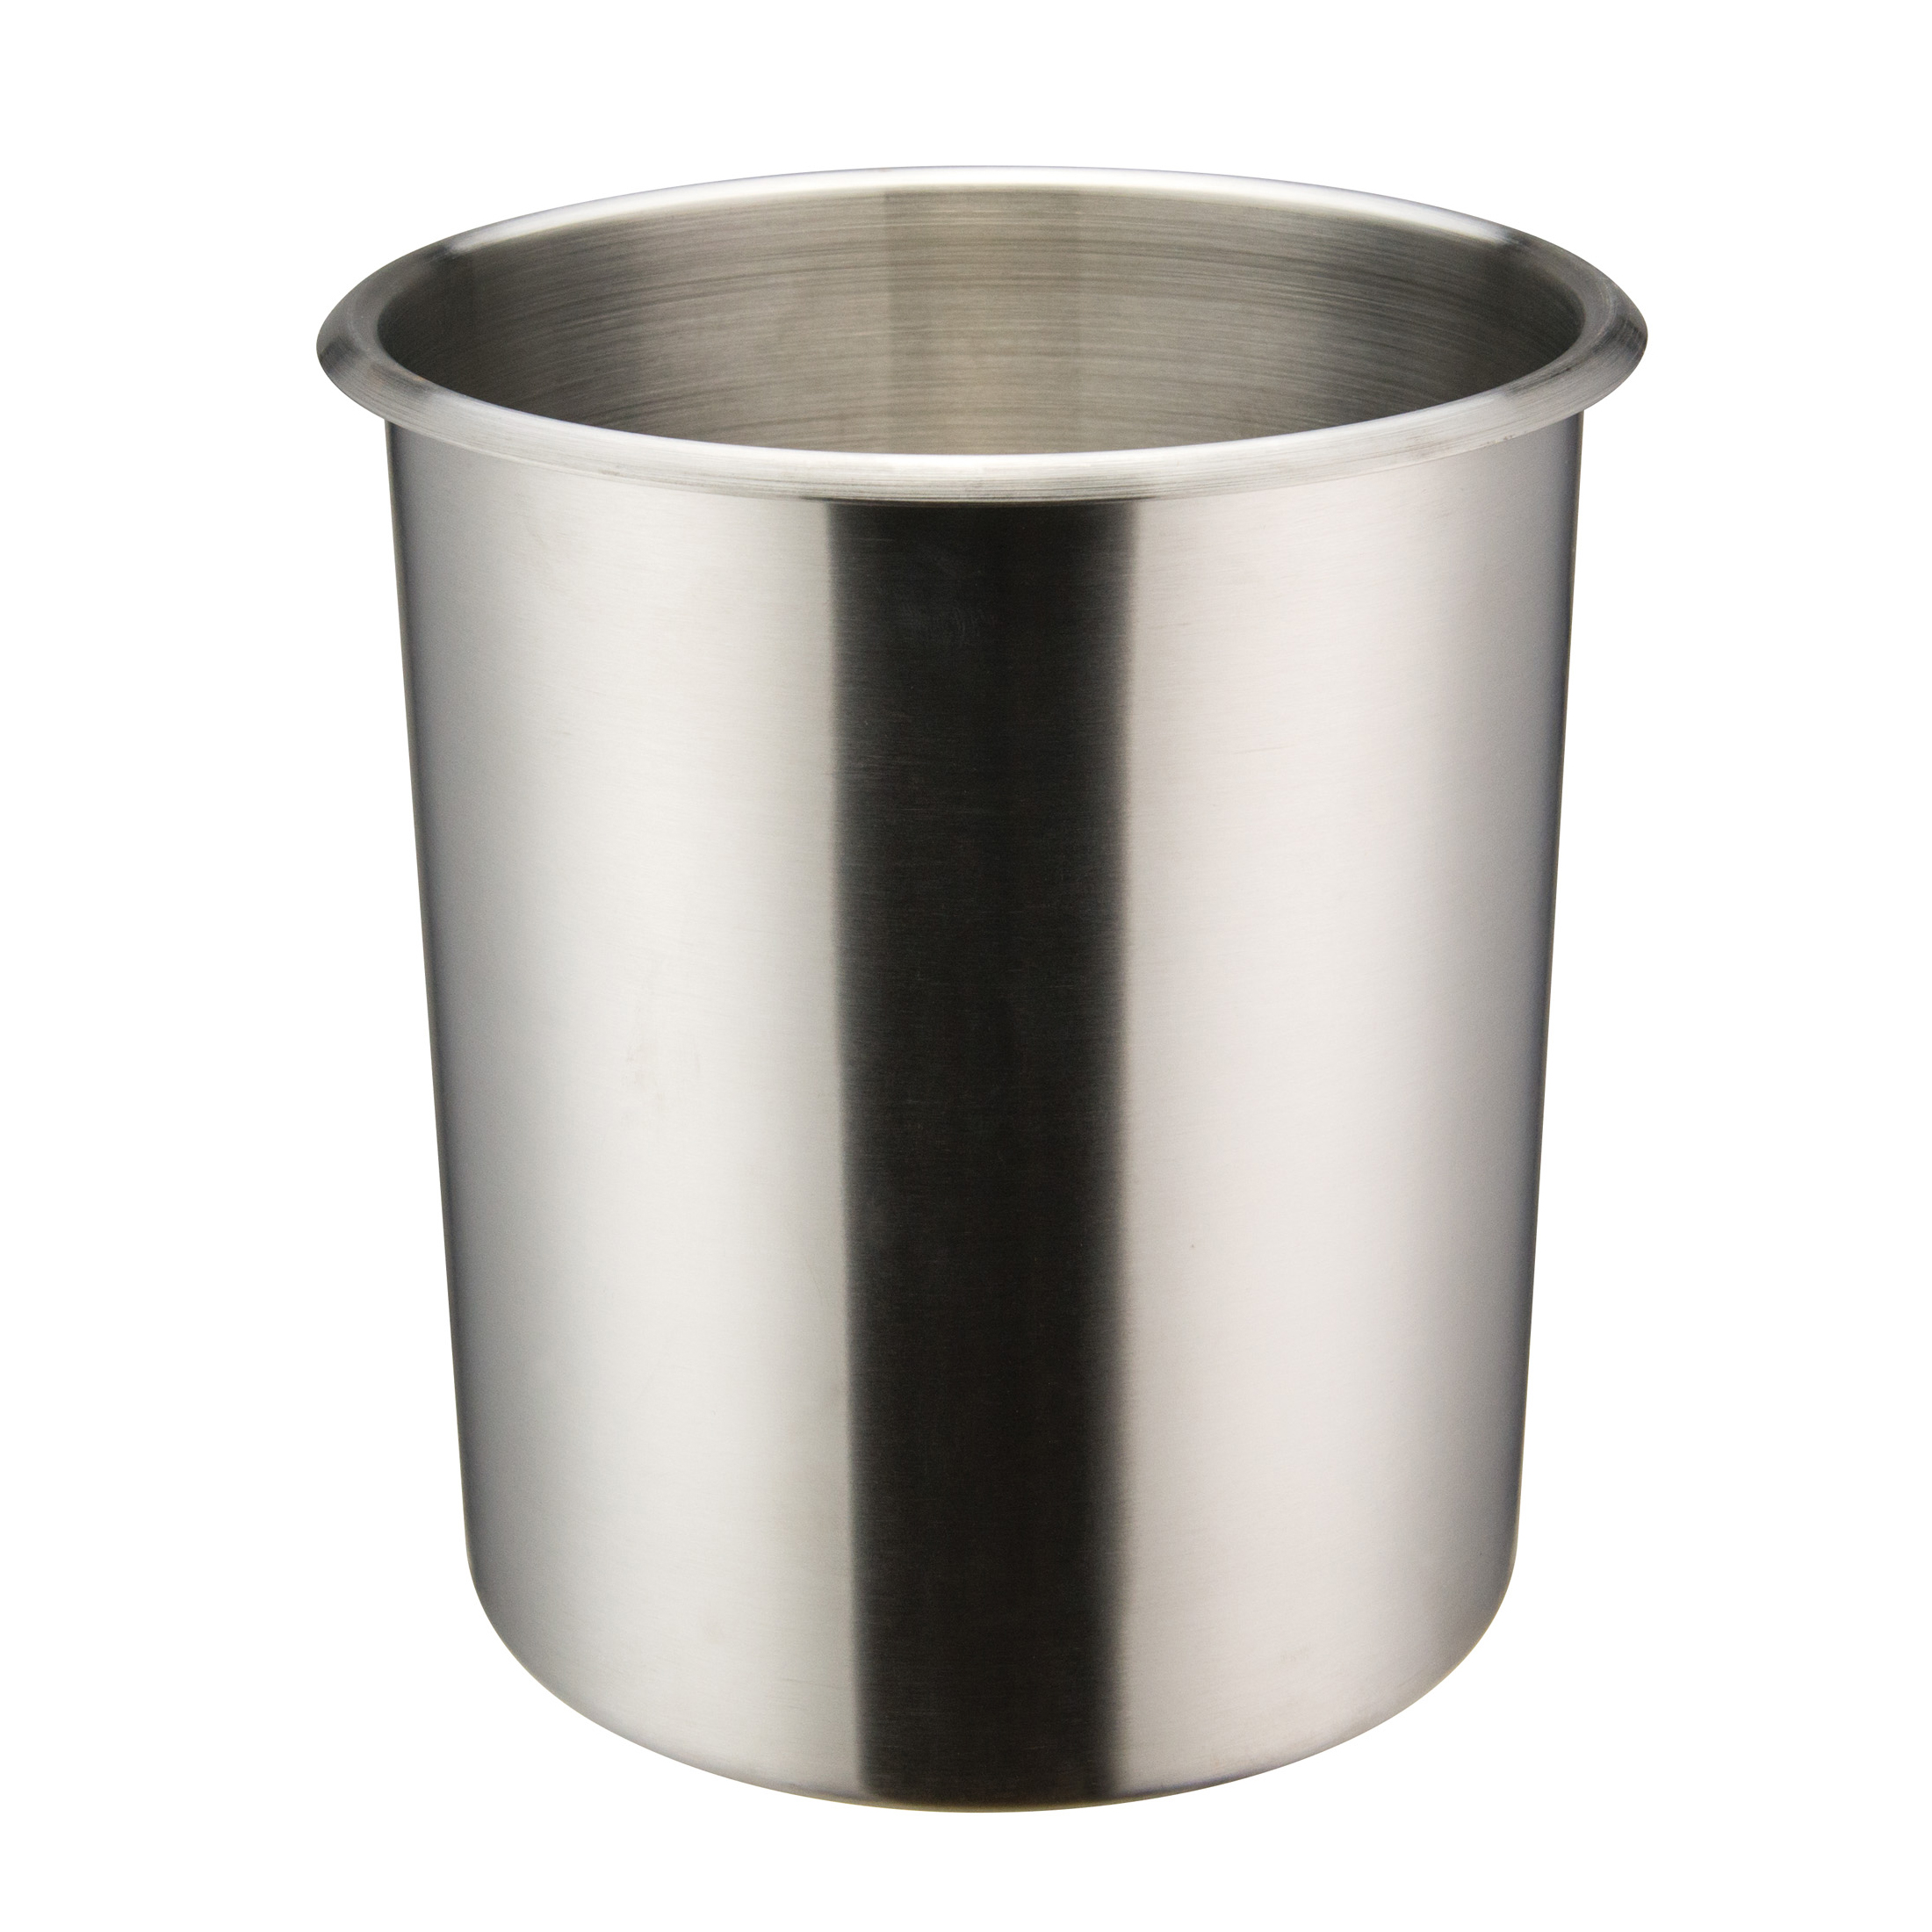 Winco BAM-6 bain marie pot